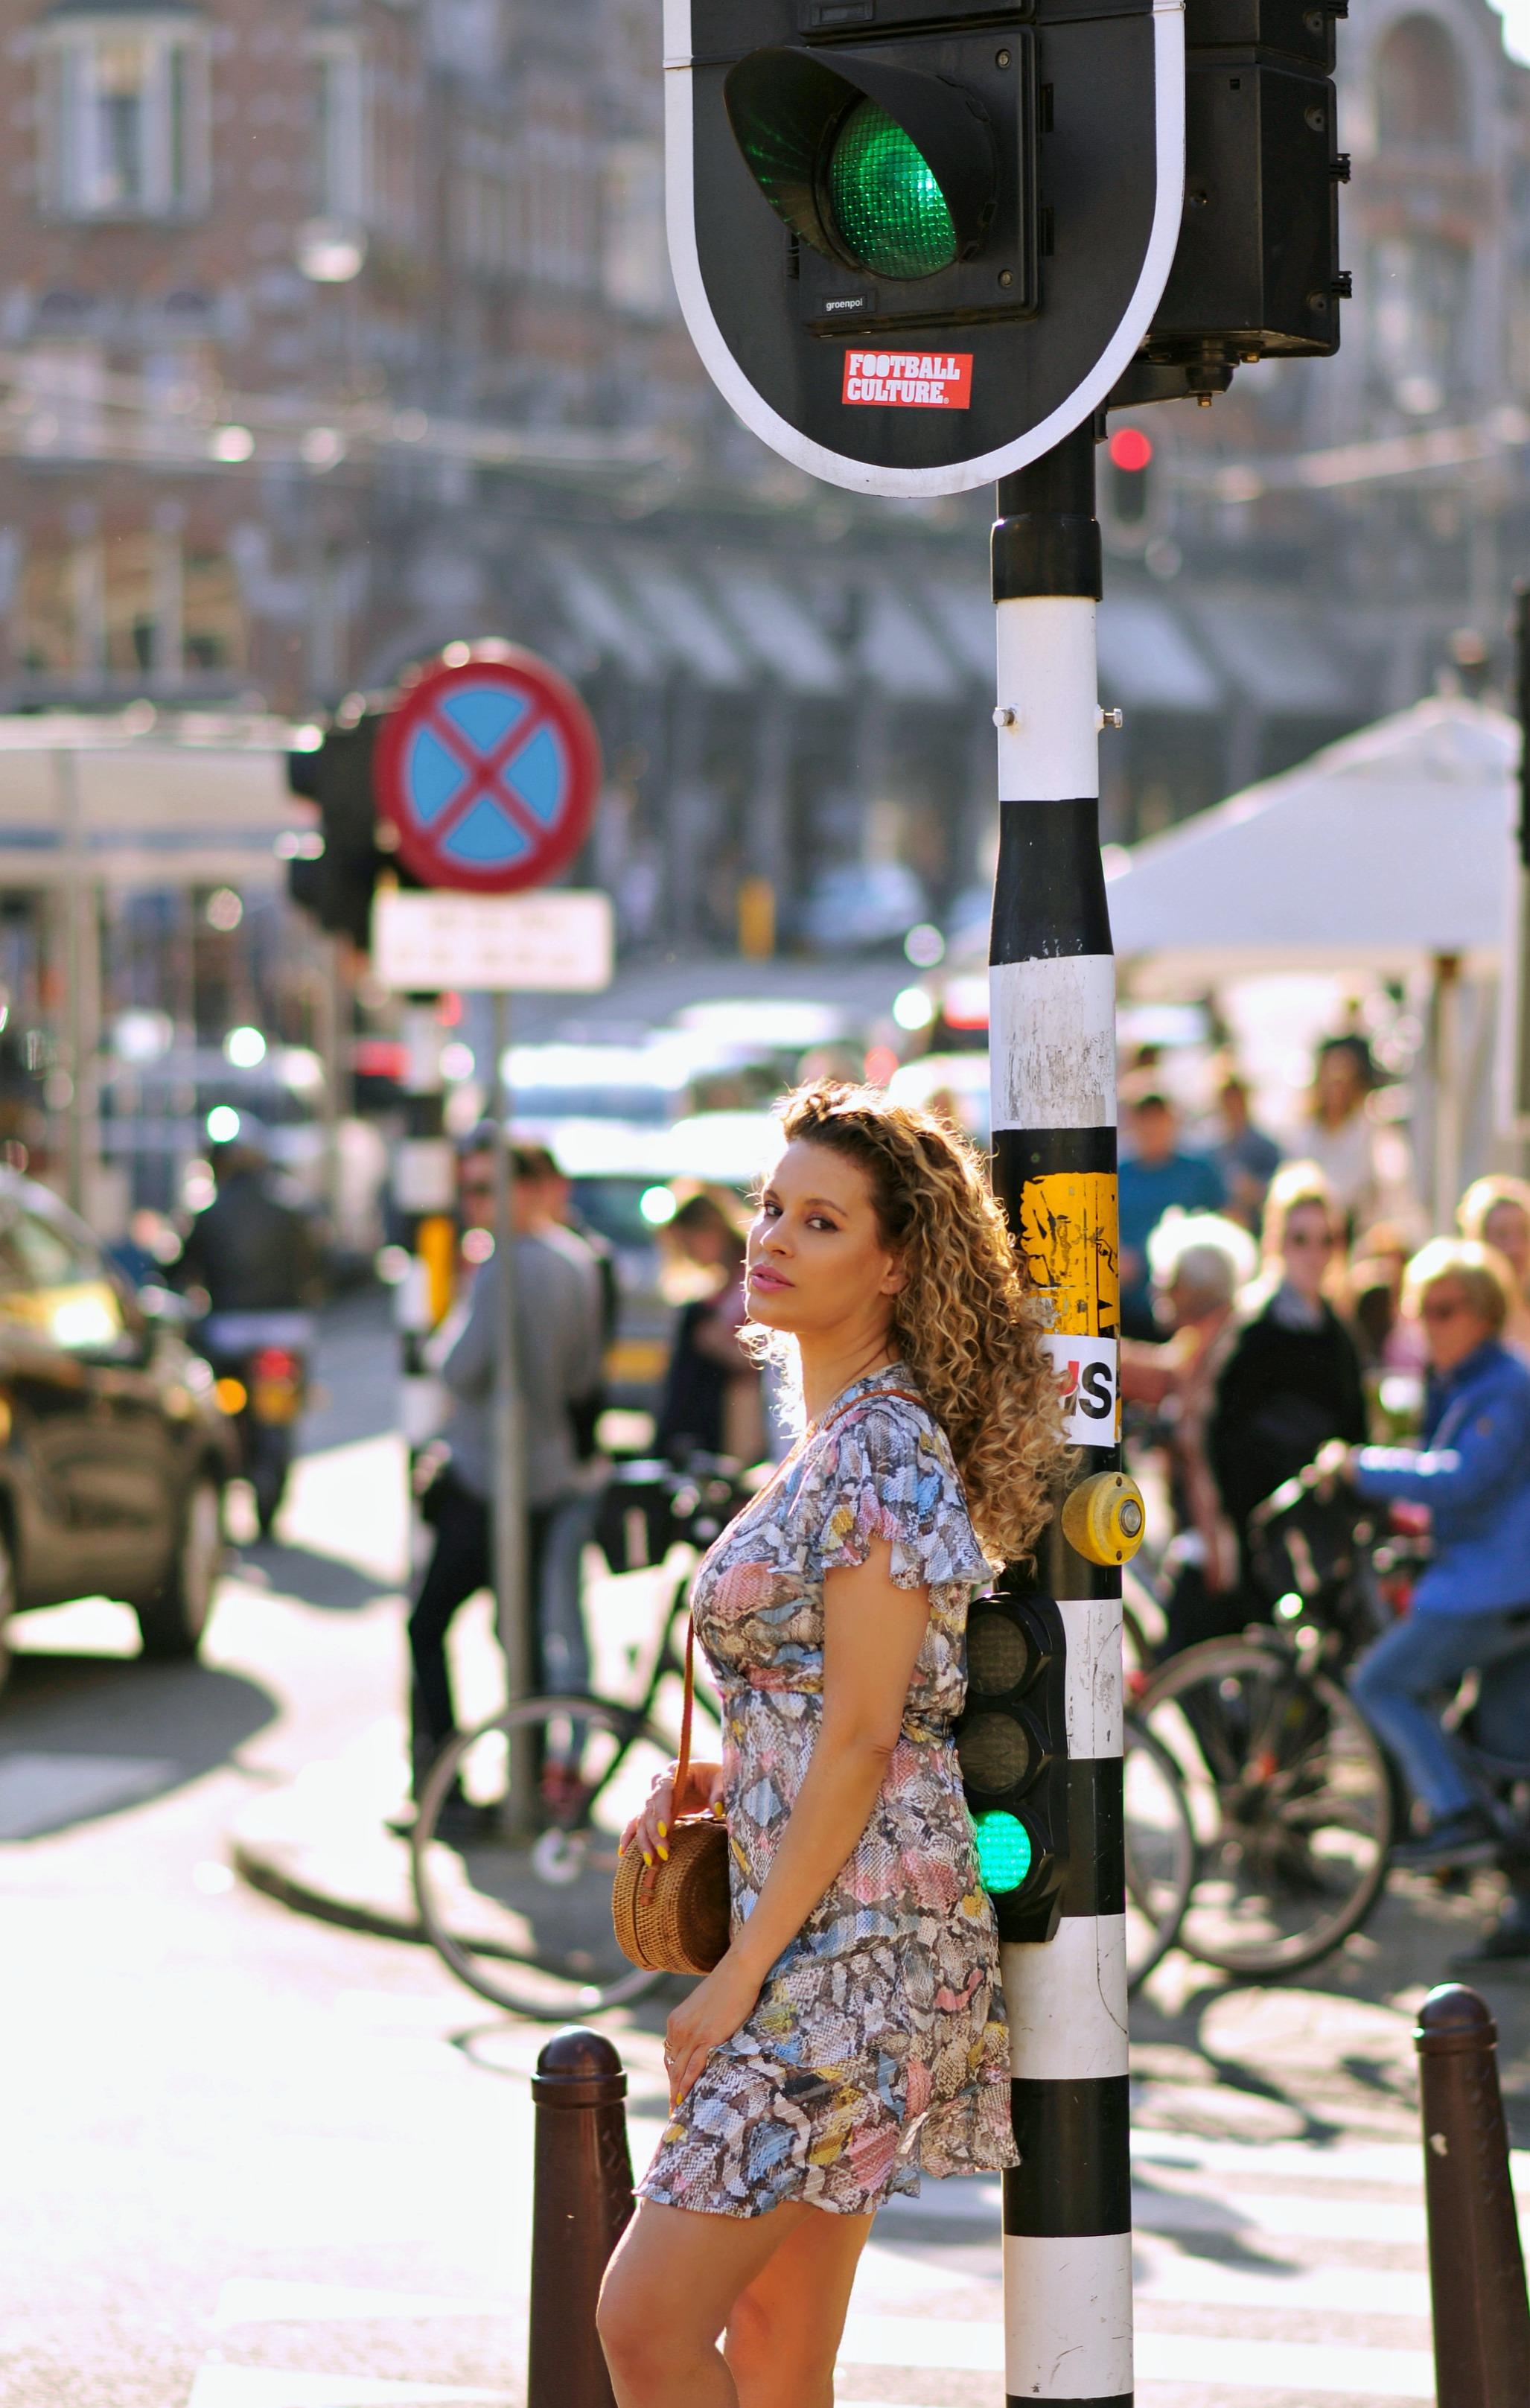 Dam square, Amsterdam, Tamara Chloé, Snakeskin dress, bali bag6